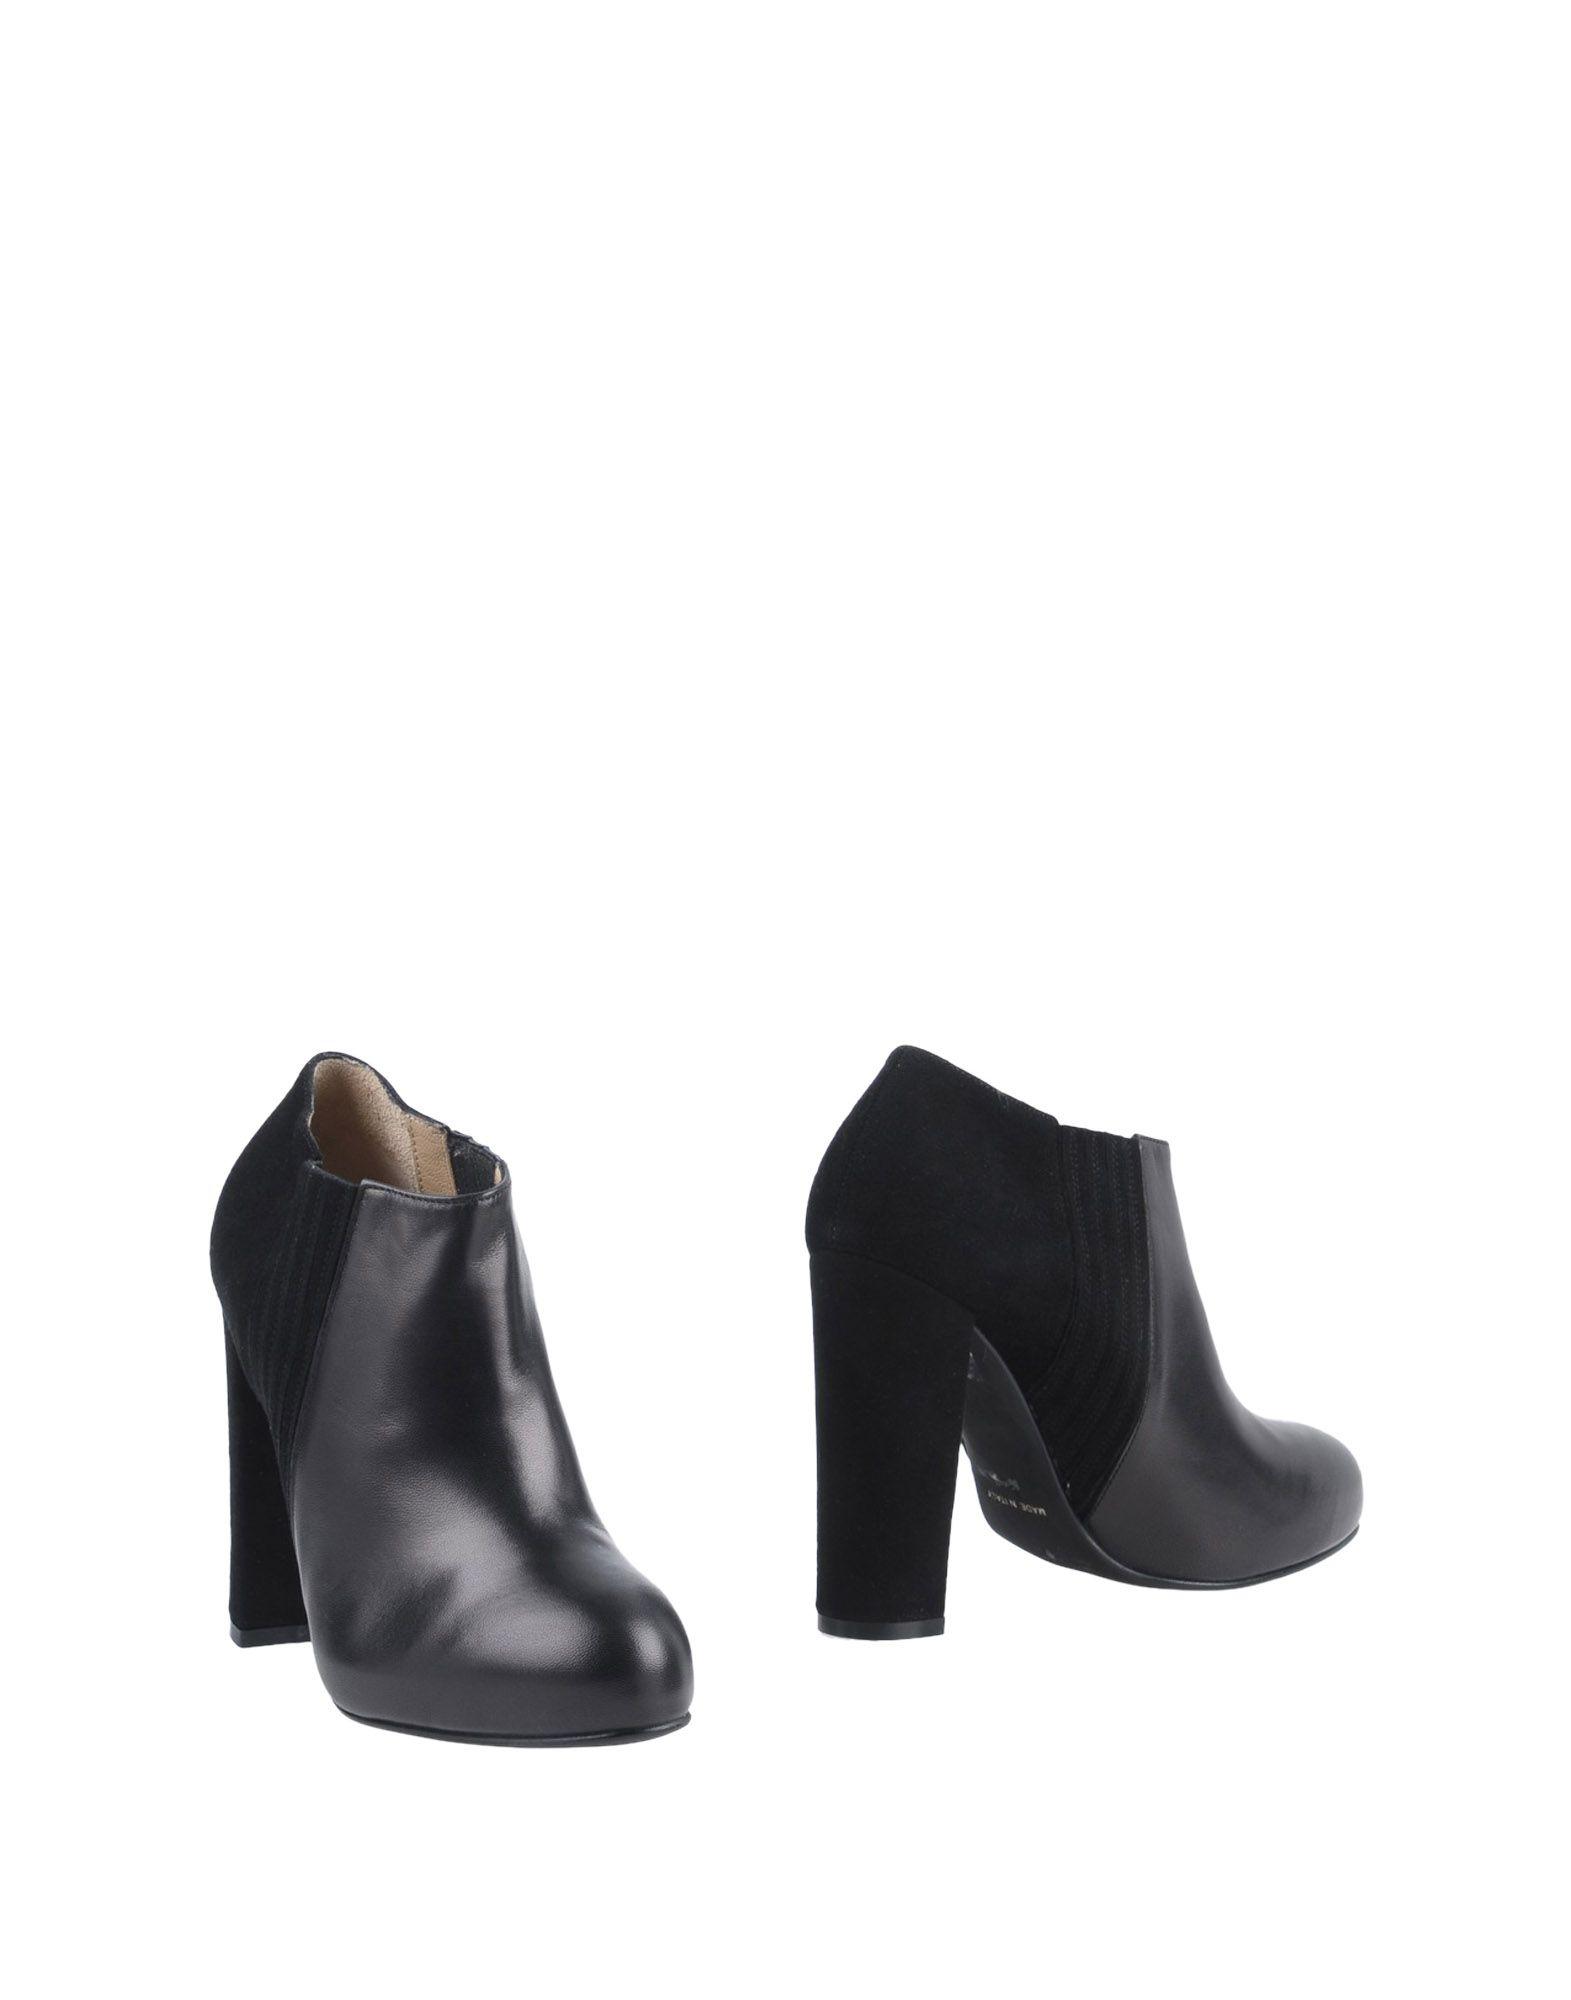 Stele Damen Stiefelette Damen Stele  11317858RJ Gute Qualität beliebte Schuhe 7d9a8c